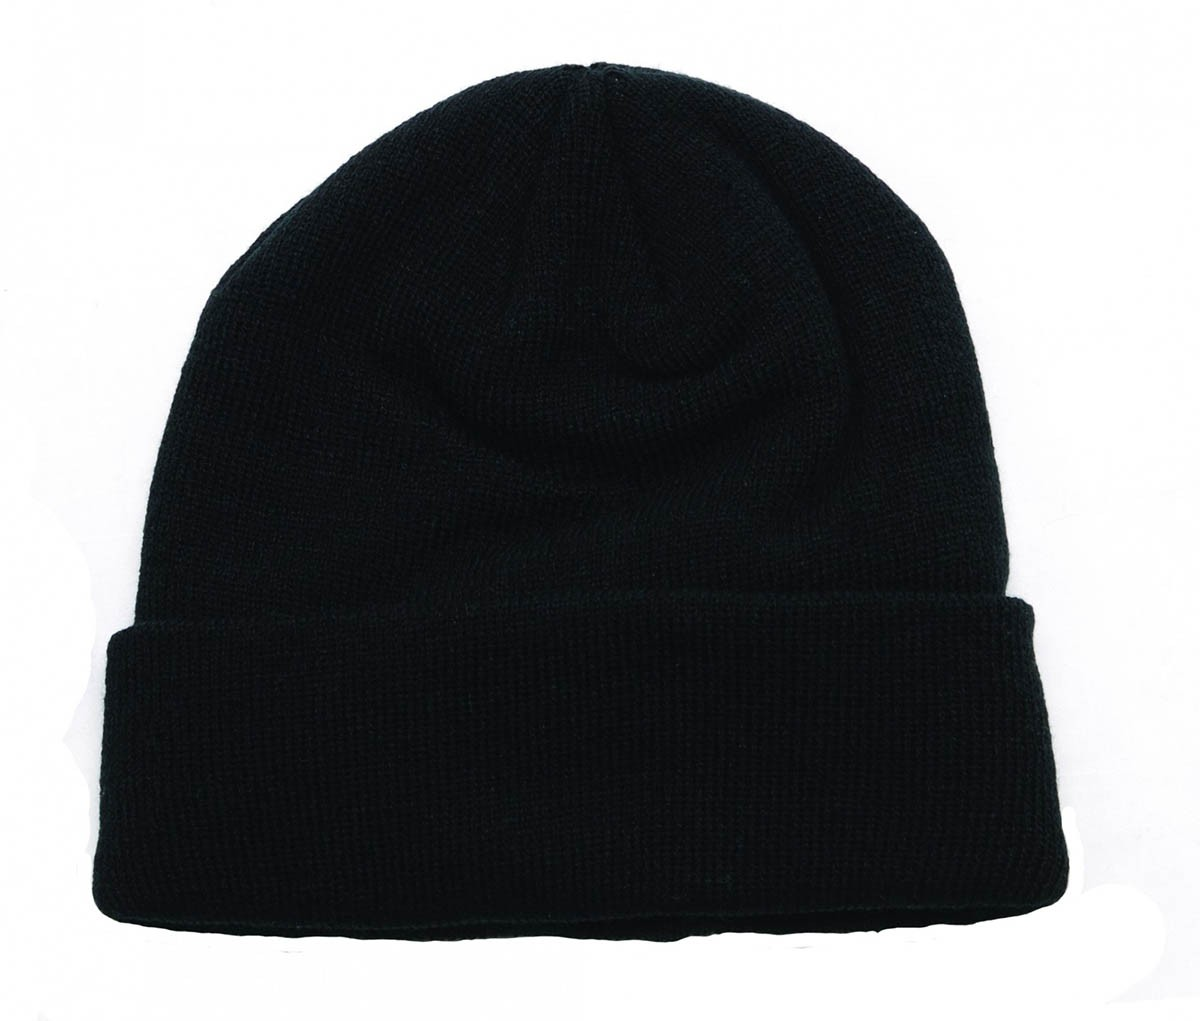 Regatta Professional TRC320 Thinsulate Hat Regatta Professional TRC320 Thinsulate  Hat ... 9dfb631d194